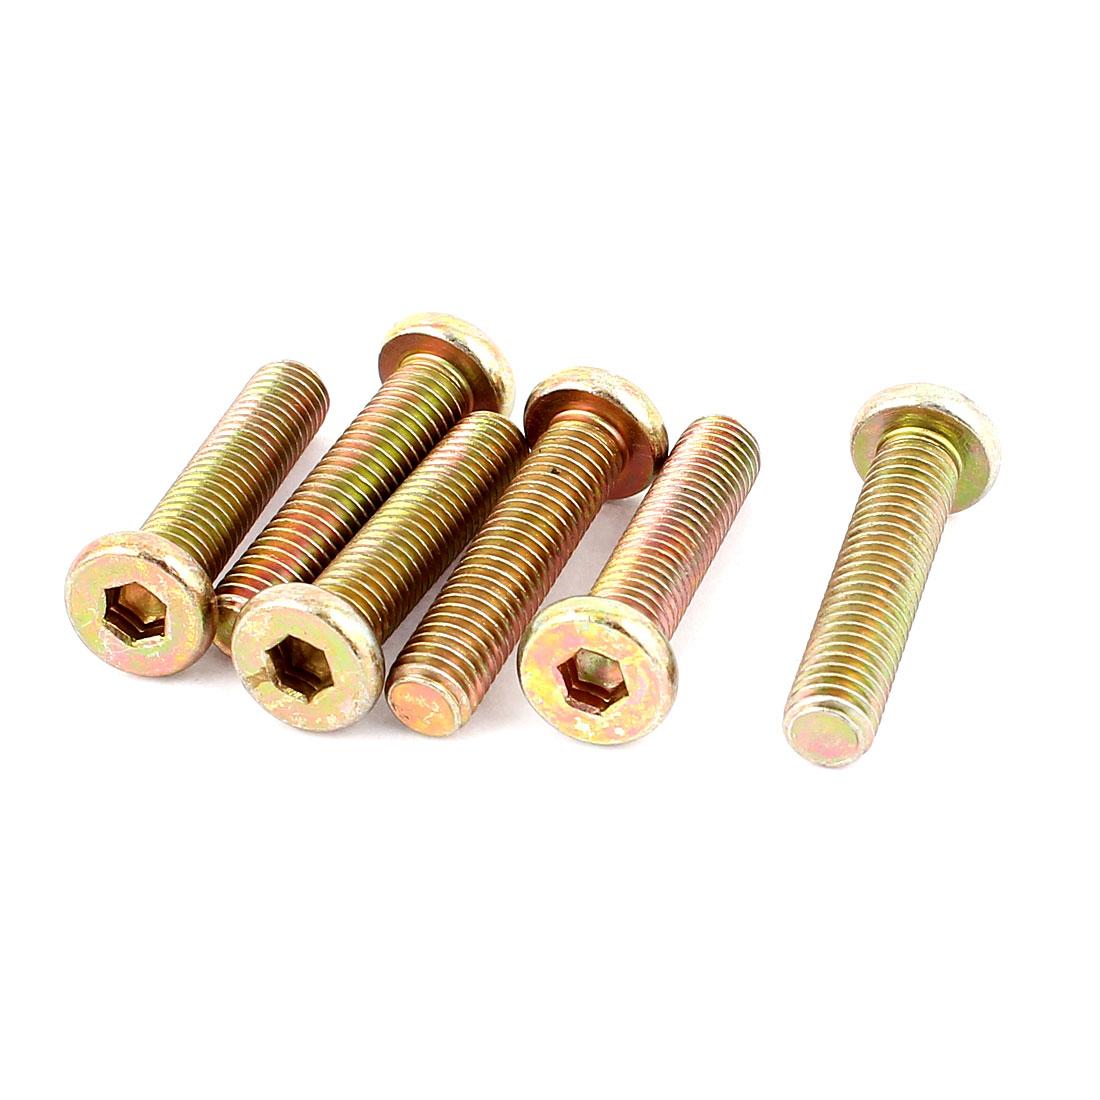 M8 x 35mm Threaded 1.25mm Pitch Hex Socket Head Cap Screws Bolts 6 Pcs